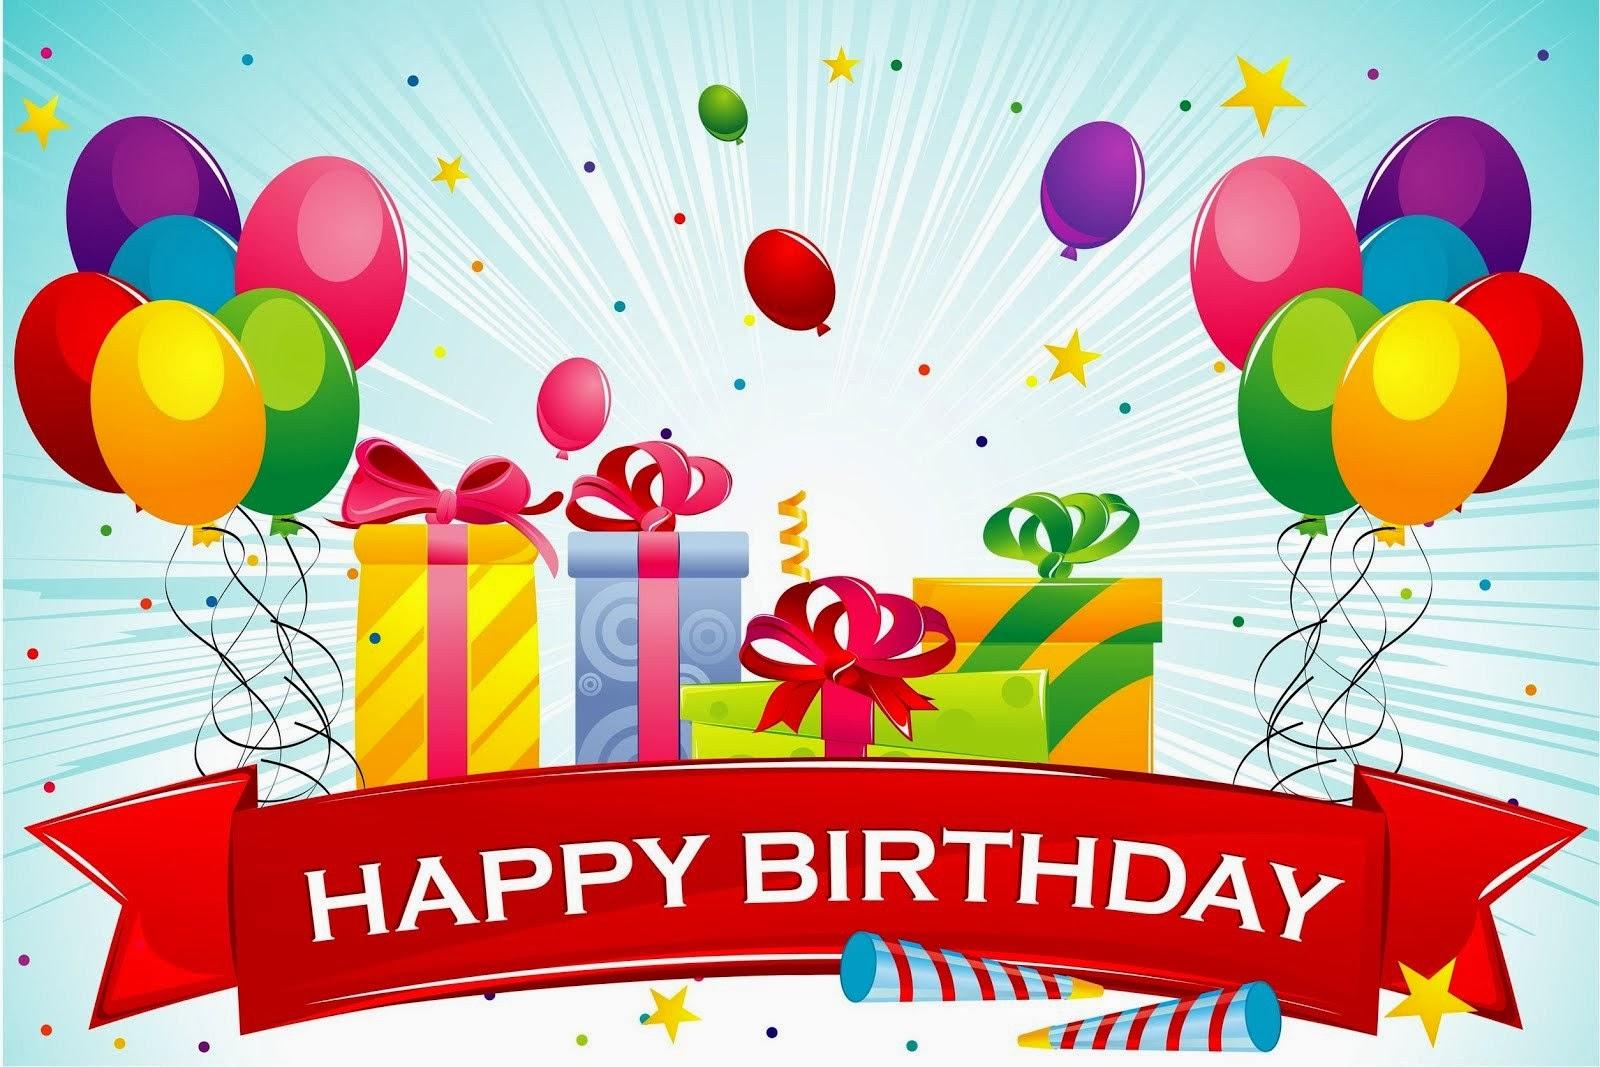 Happy Birthday Wallpaper Download Unique Wallpapers 1600x1067